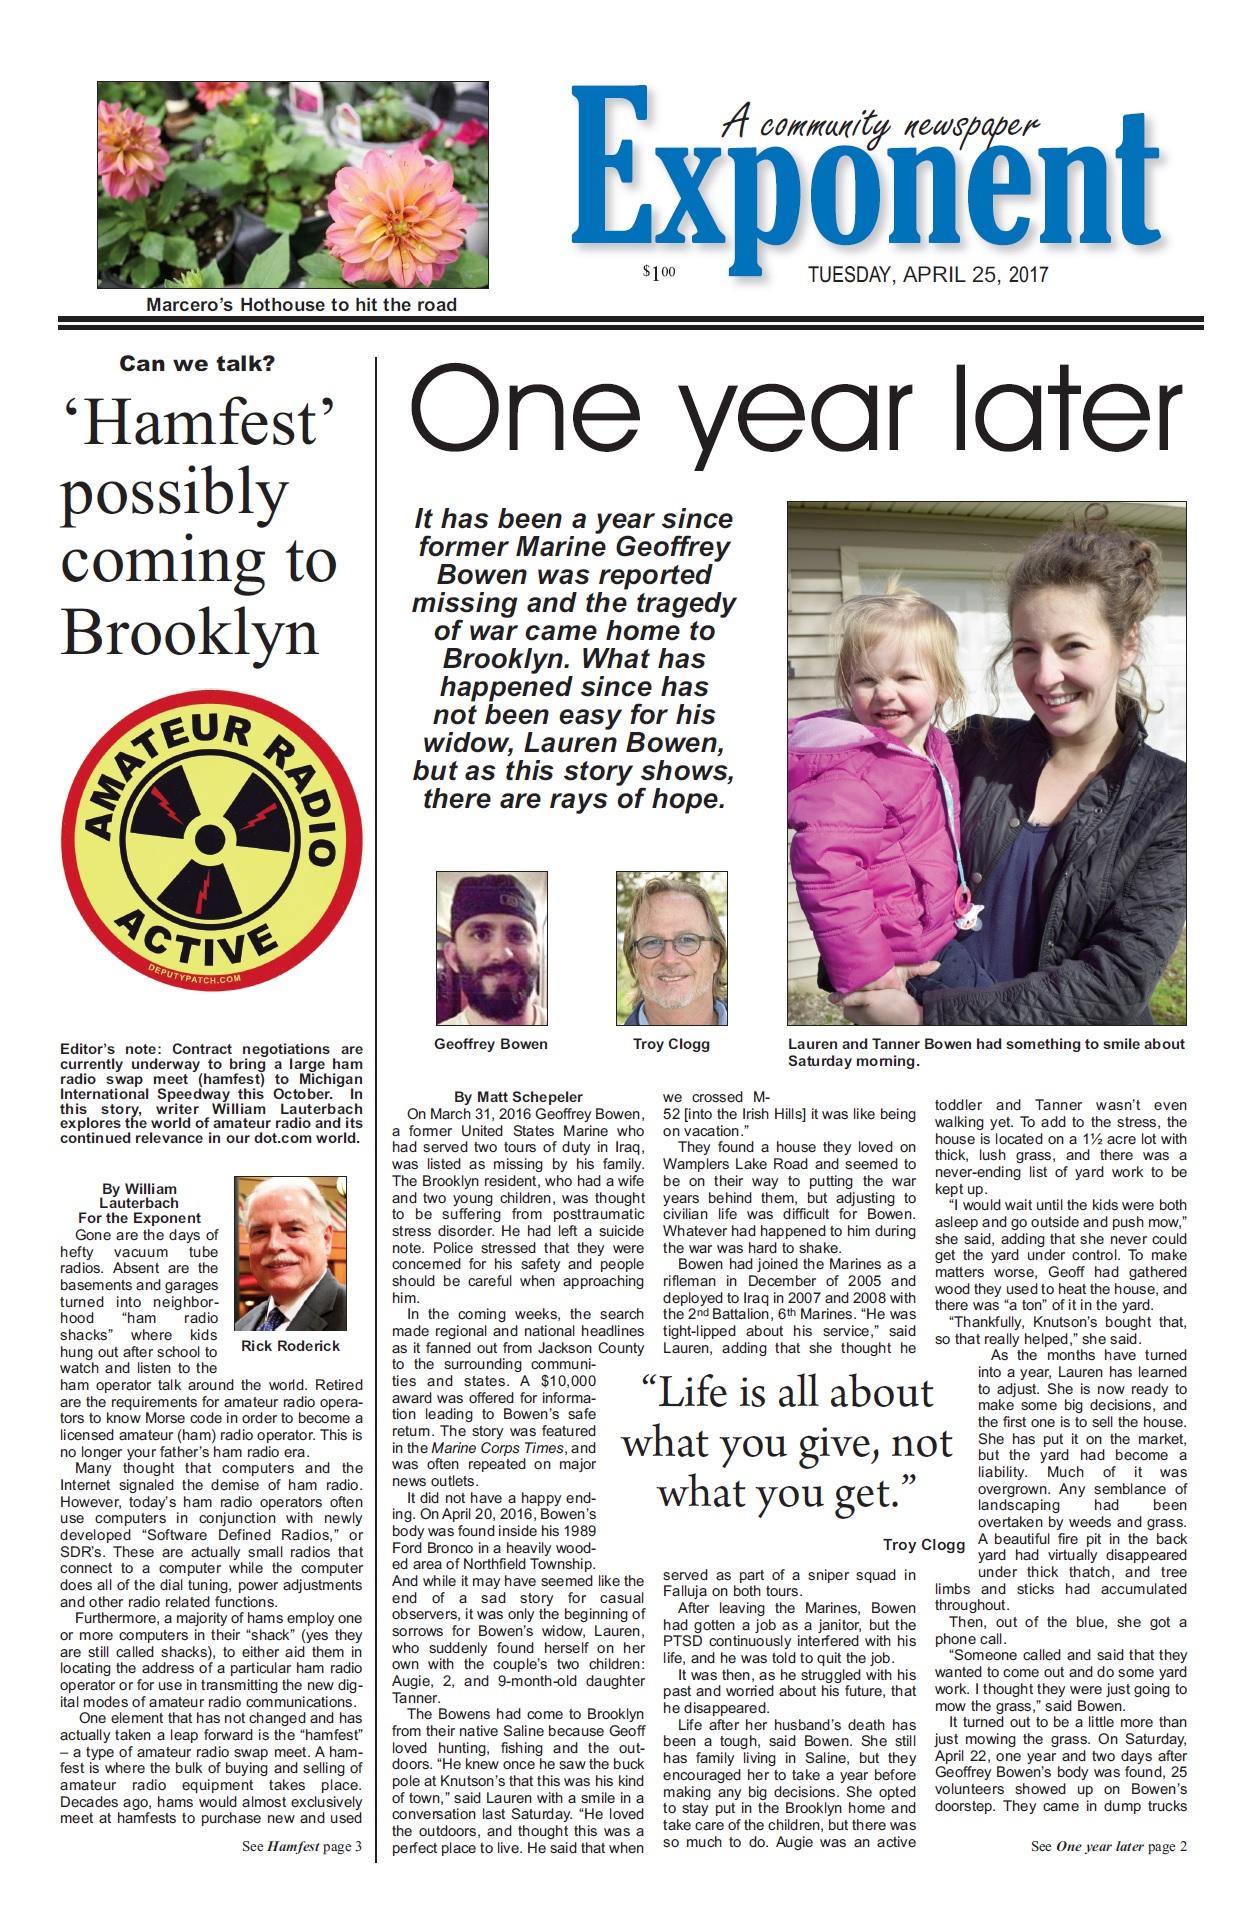 Landscape contractors SE Michigan - community newspaper article